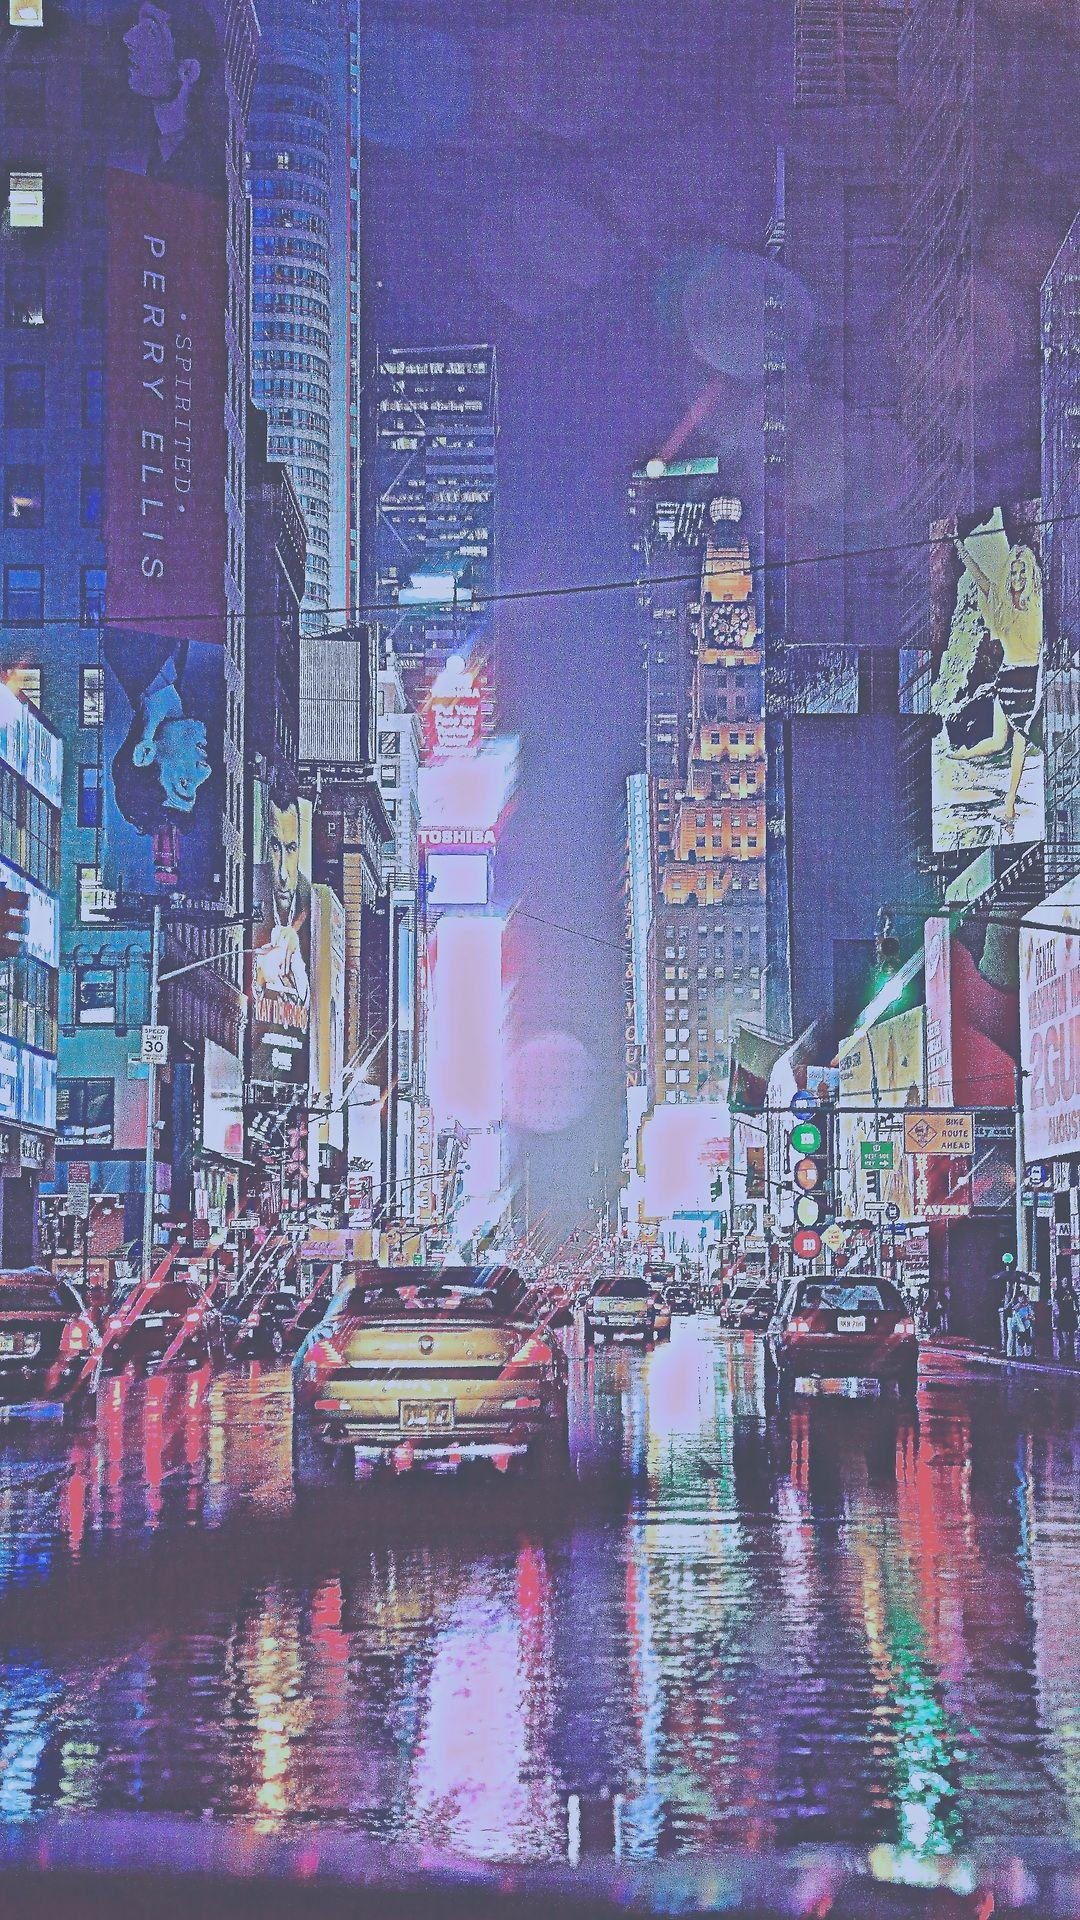 New York Iphone Wallpaper Vintage Christmas Aesthetic Wallpaper Wallpapers Vintage